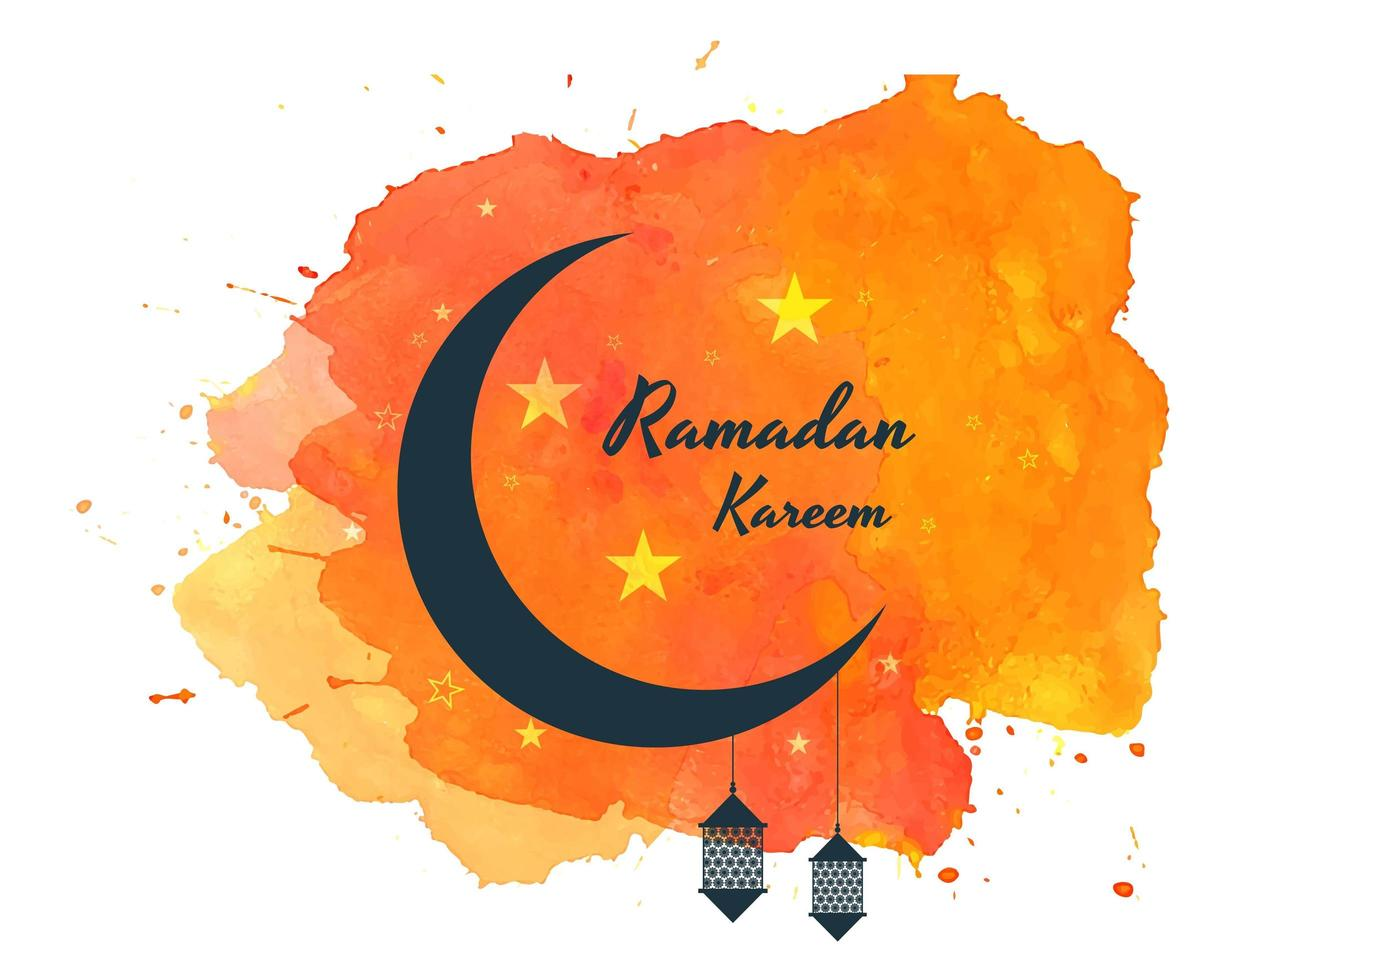 Ramadan Kareem Moon on Orange Watercolor Splash vector